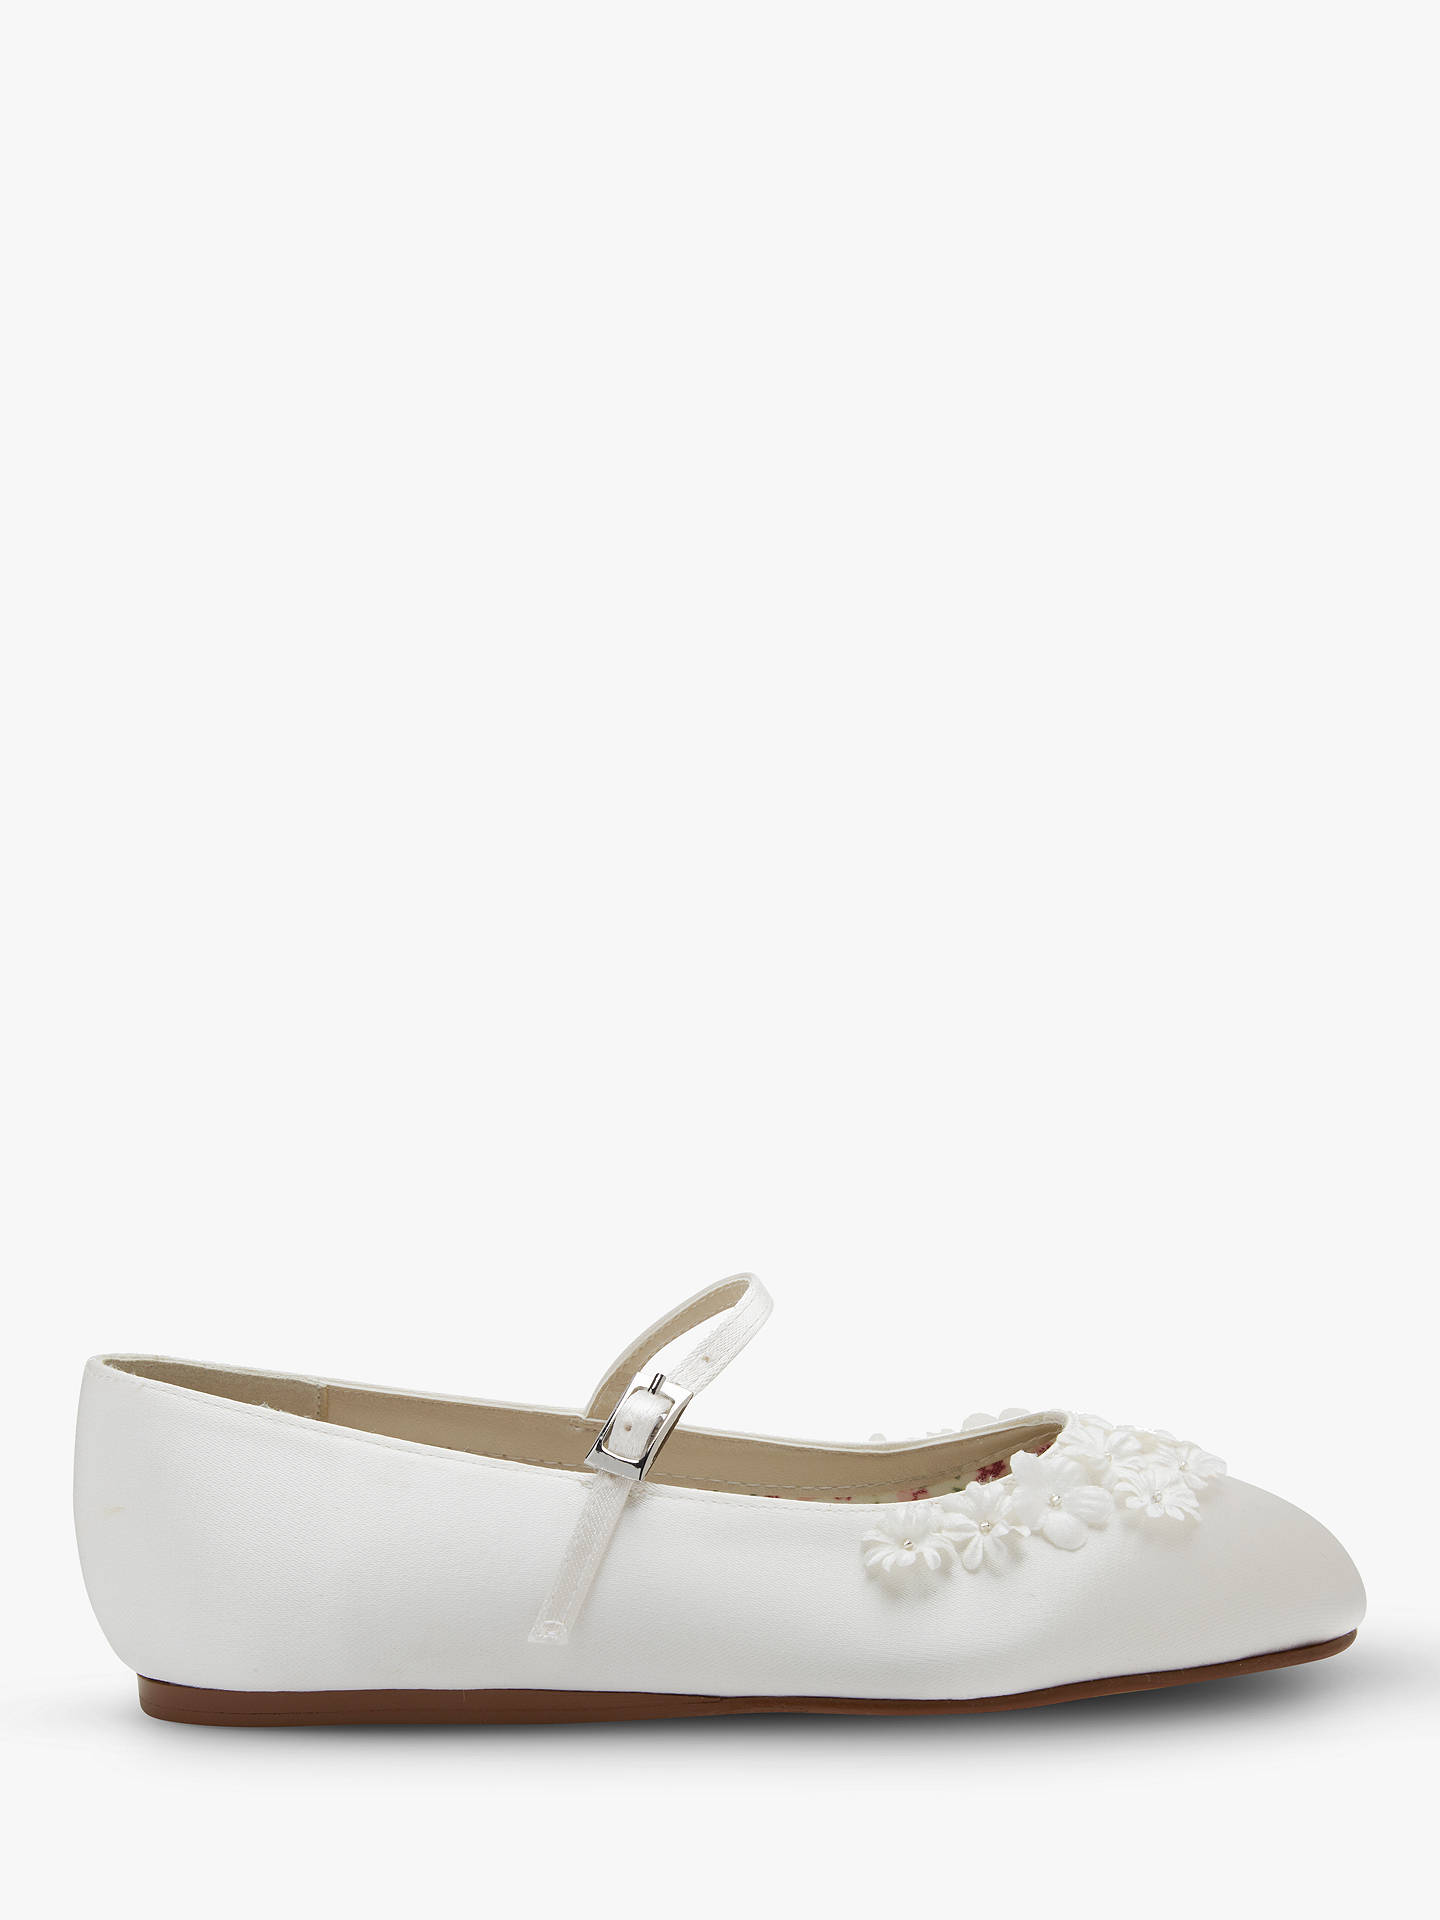 566307b51659 Buy Rainbow Club Children s Summer Satin Bridesmaid Shoes